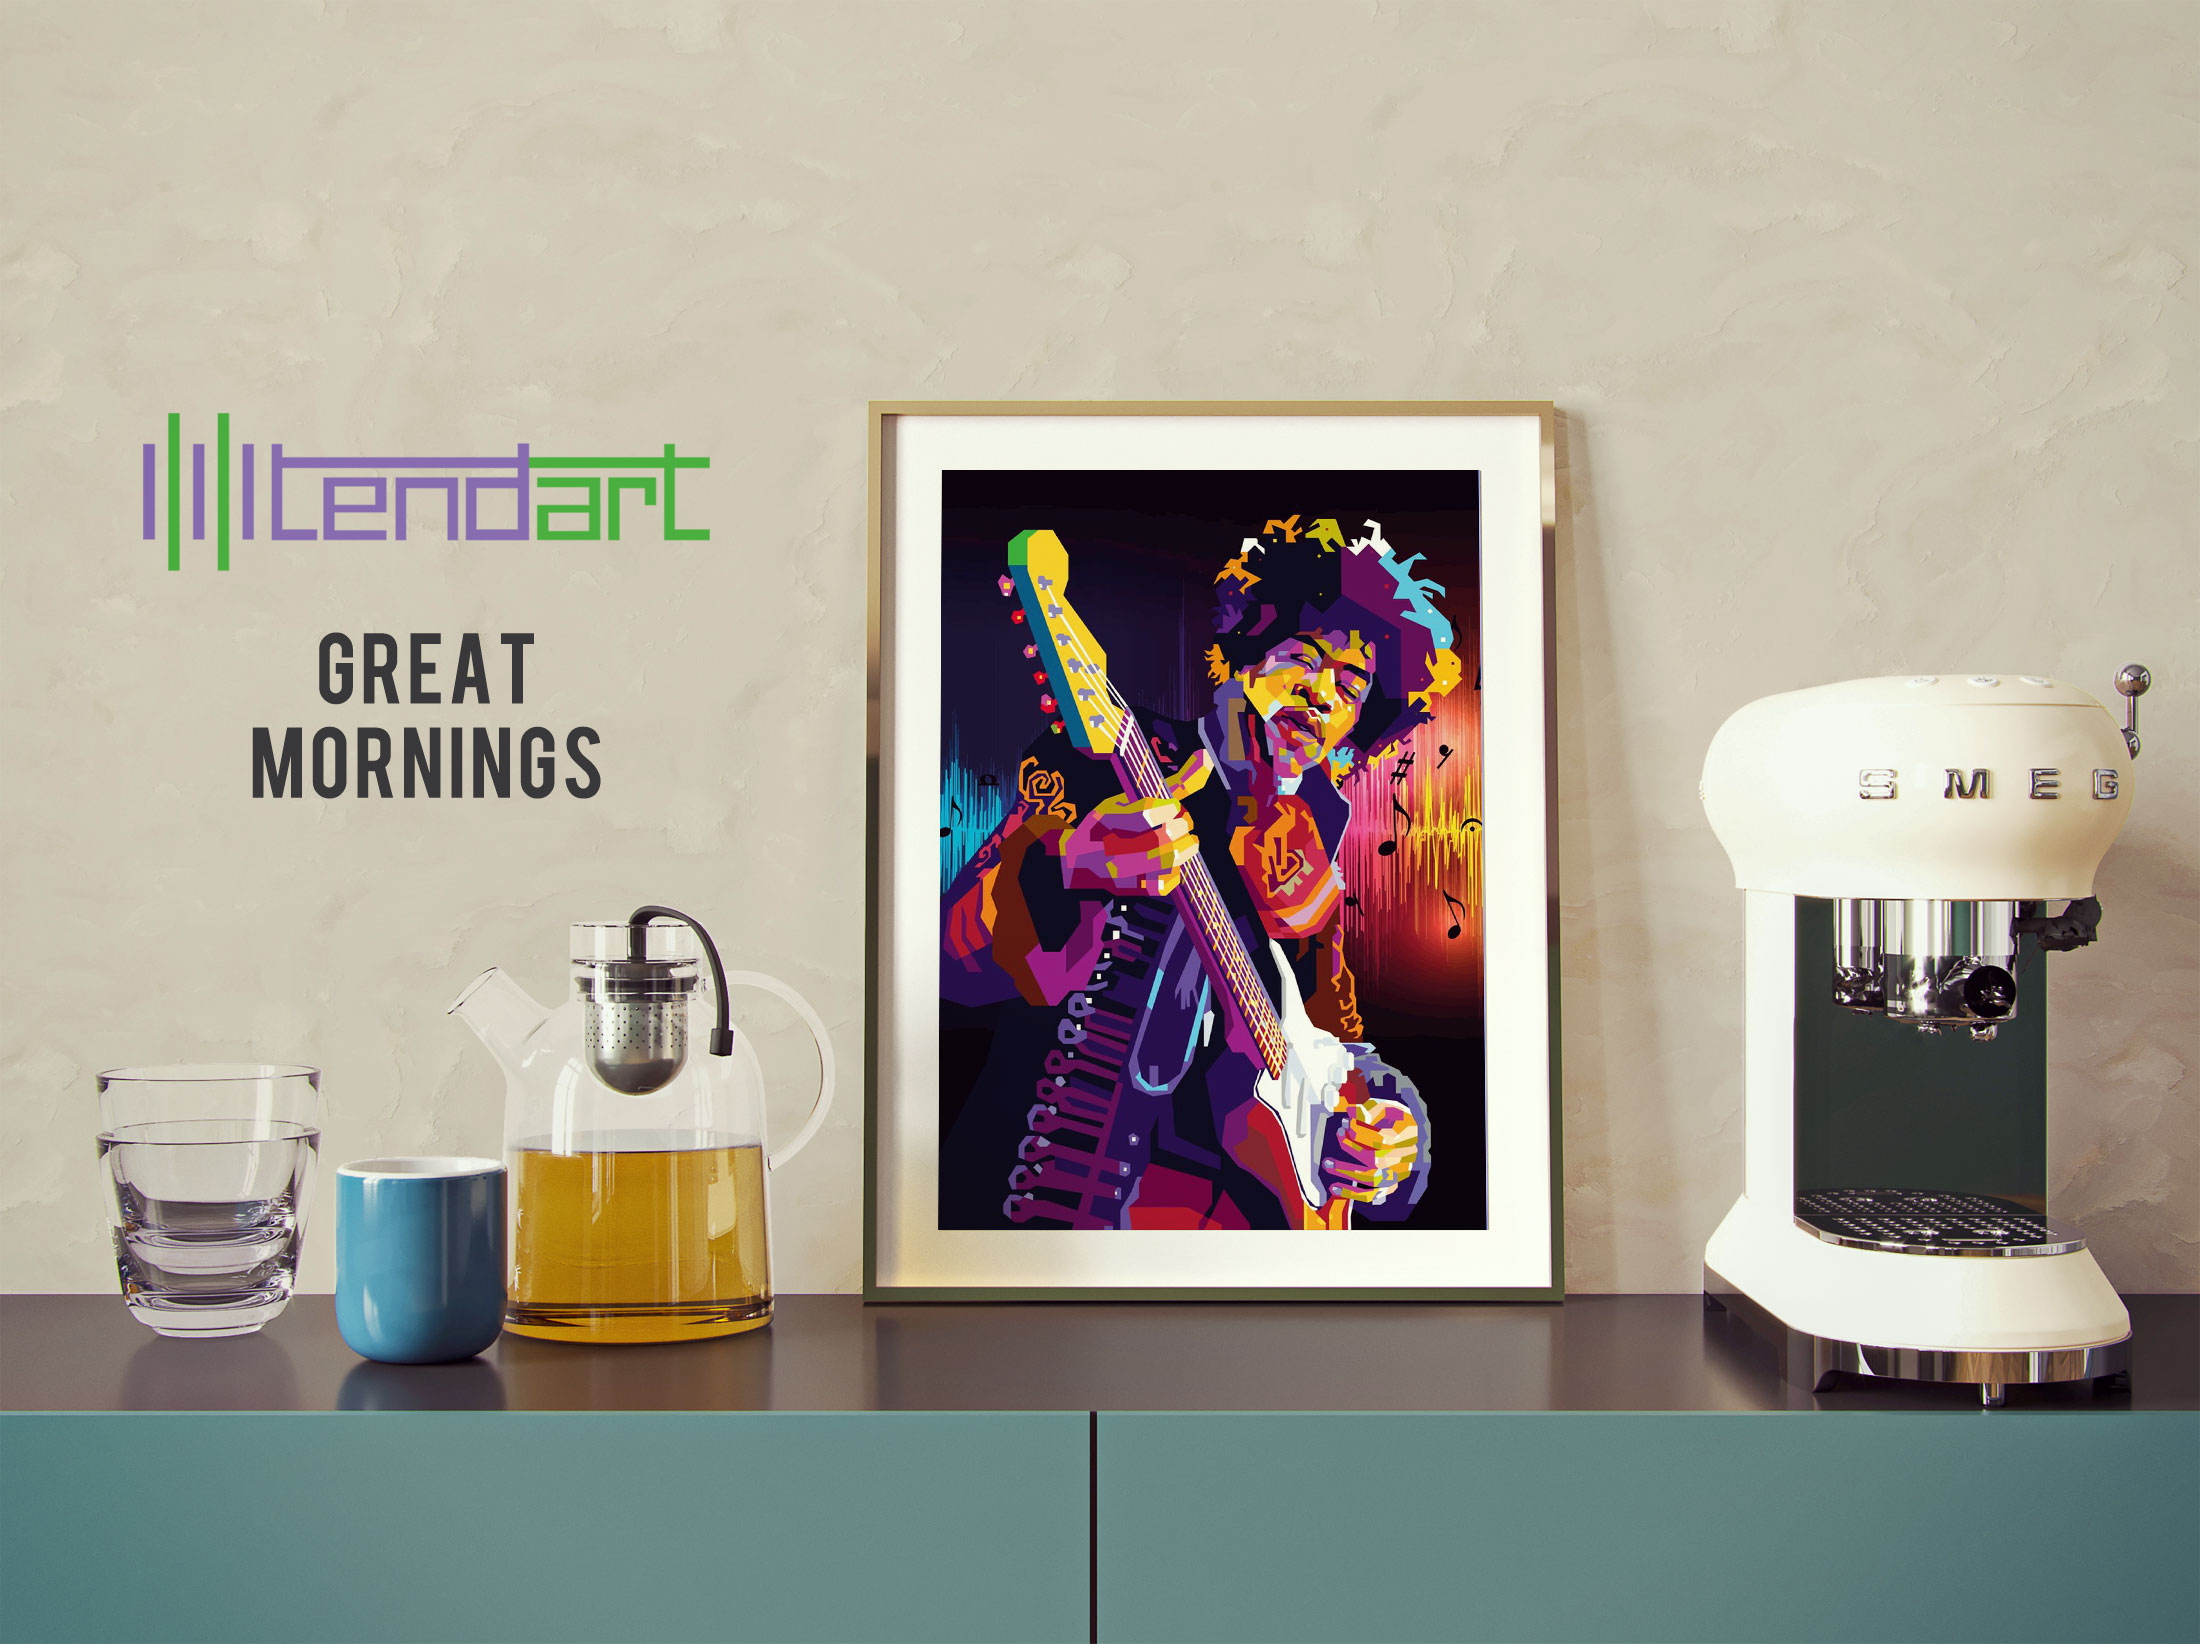 Hey Joe Jimi Hendrix tendart torbjorn endrerud dga painting